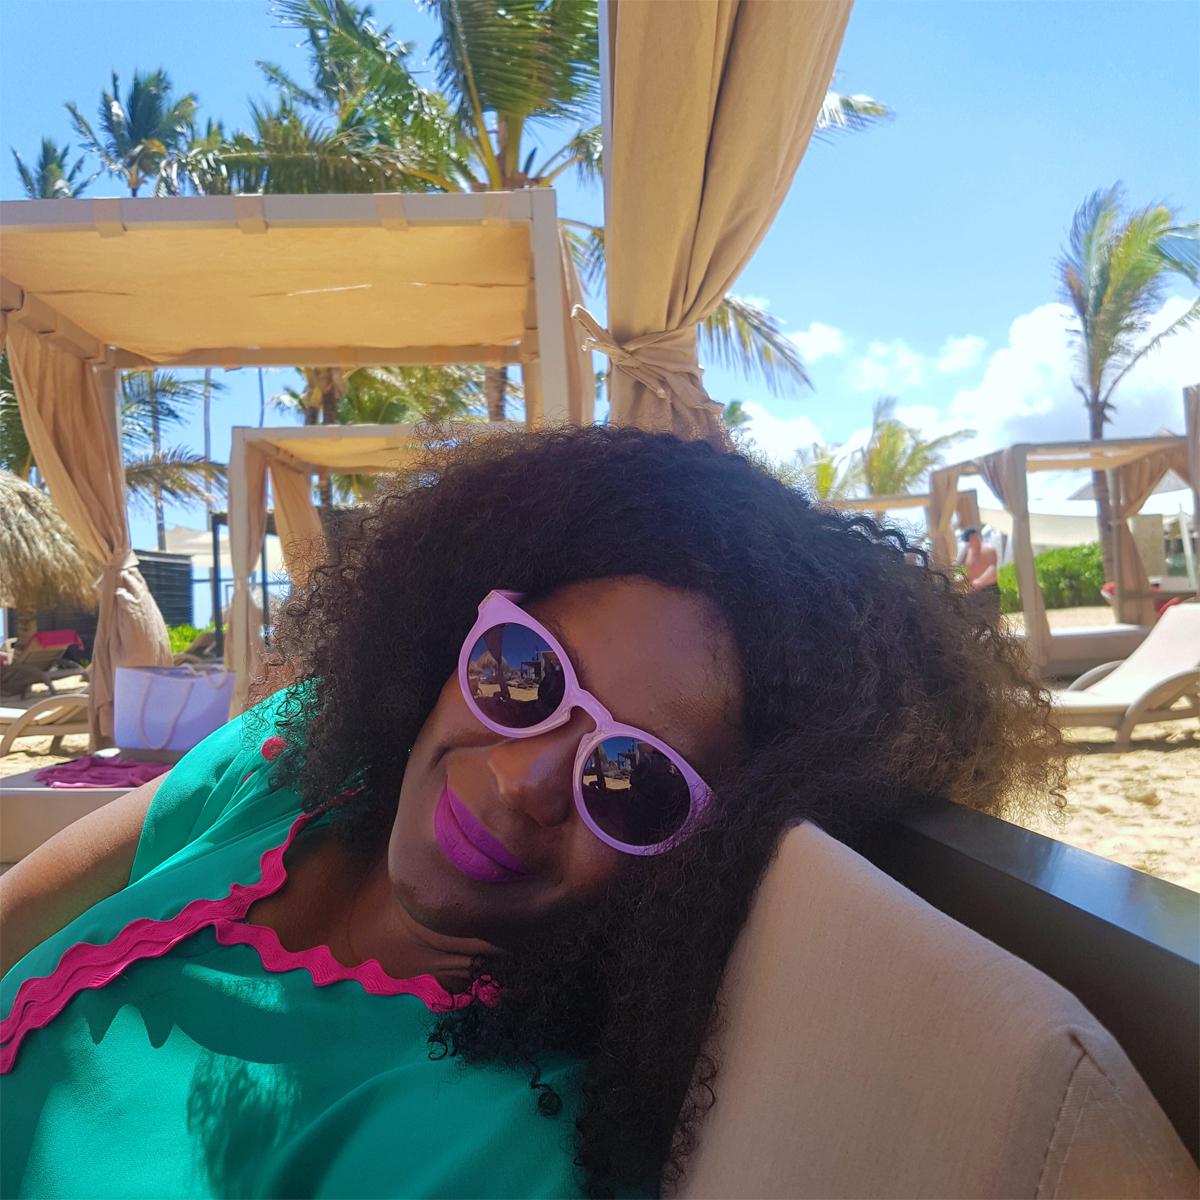 dominican republic resorts, punta cana resorts, chic punta cana, all exclusive dominican republic, sunwing vacations, sunwing all inclusive 05